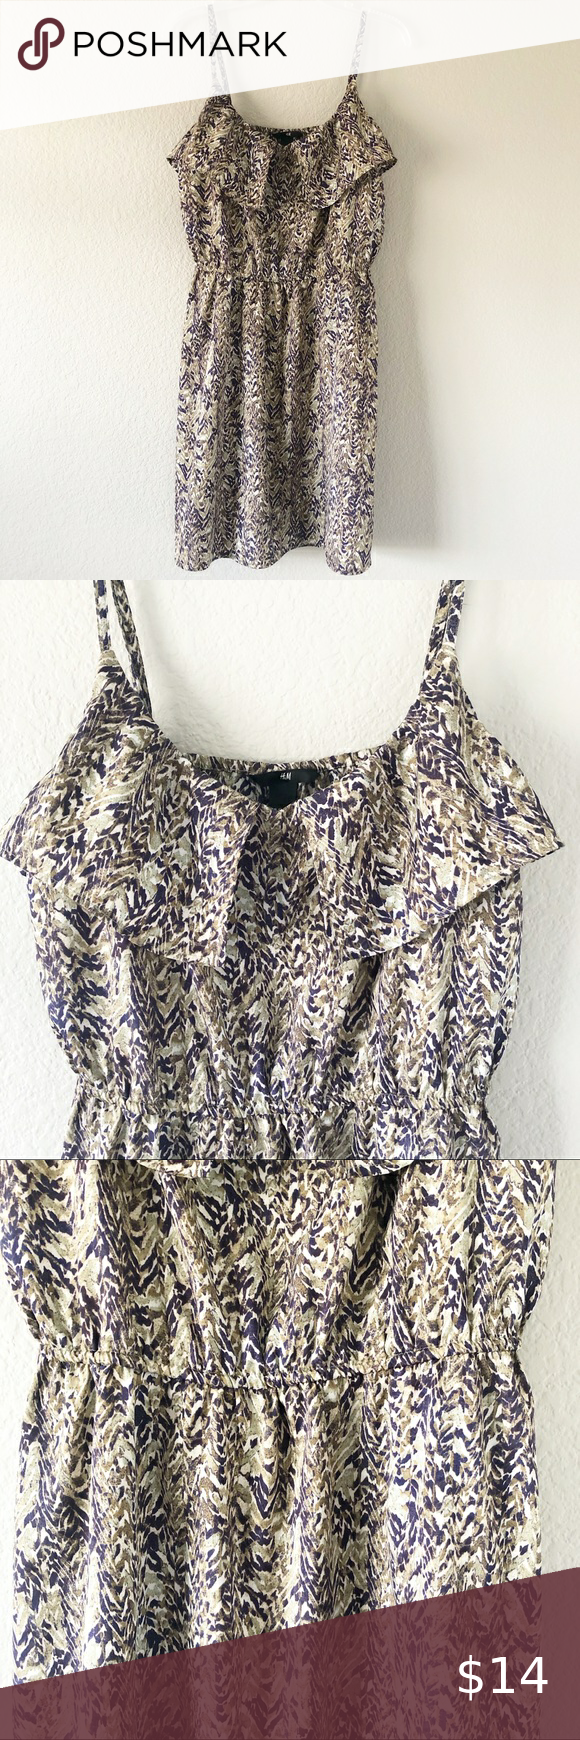 H M Cami Summer Dress Size 12 Summer Dresses Clothes Design Dresses [ 1740 x 580 Pixel ]